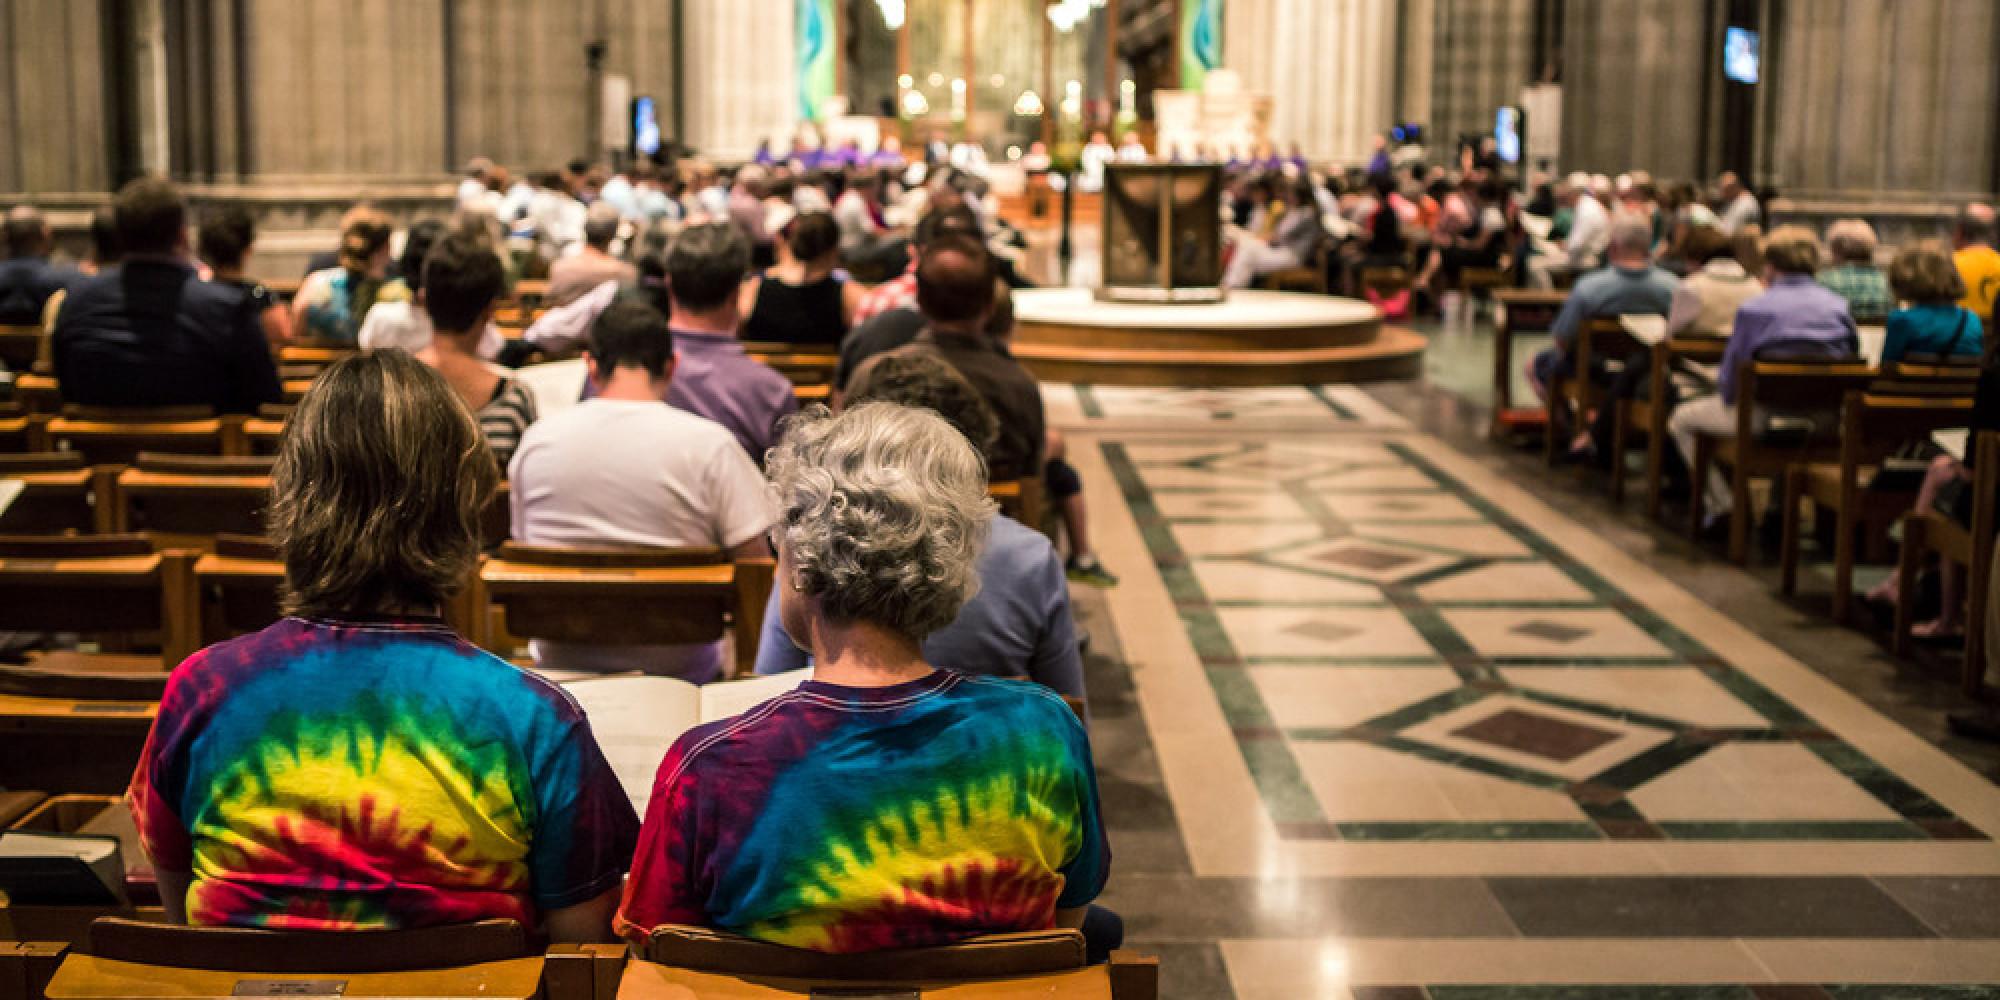 o-gay-friendly-churches-facebook_1.jpg